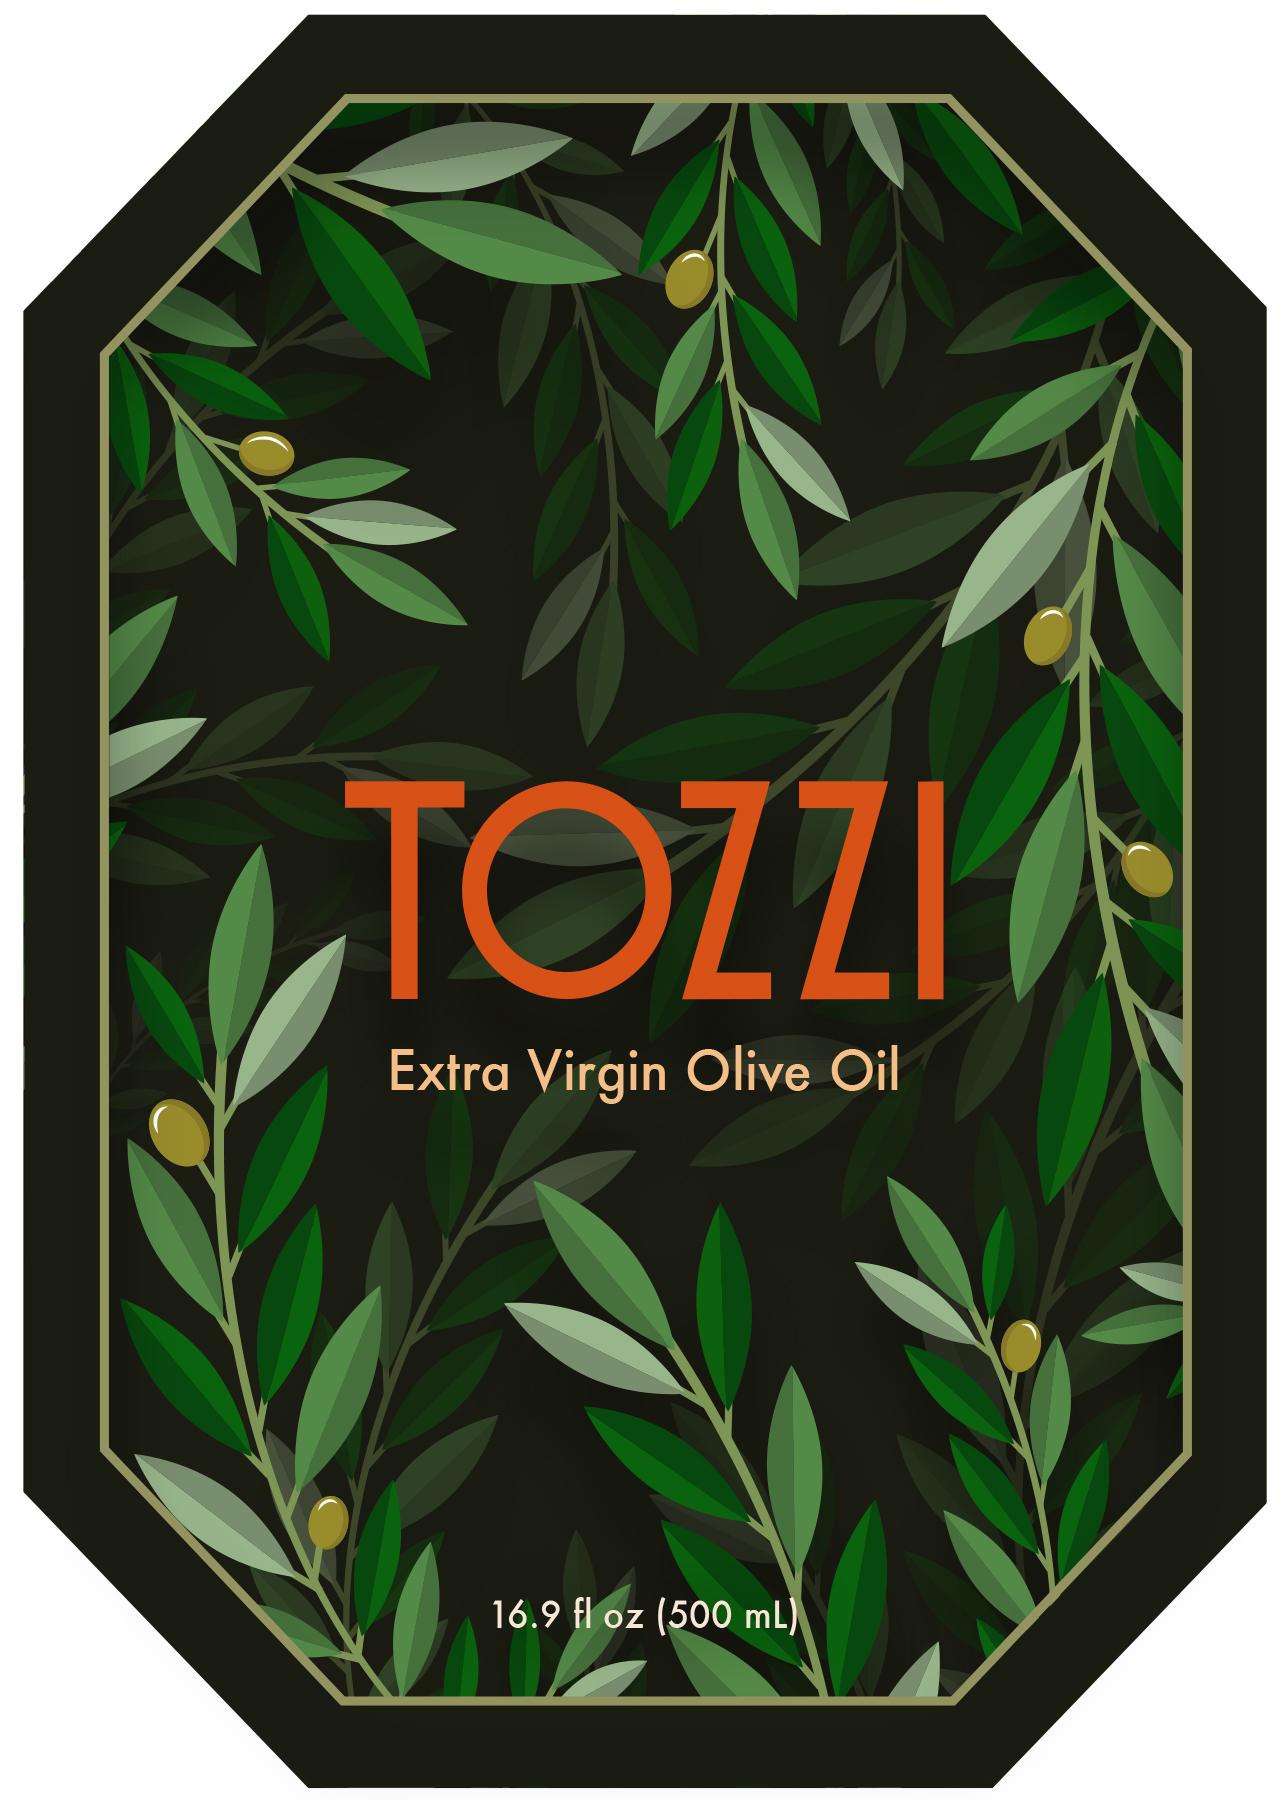 tozzi 1.jpg